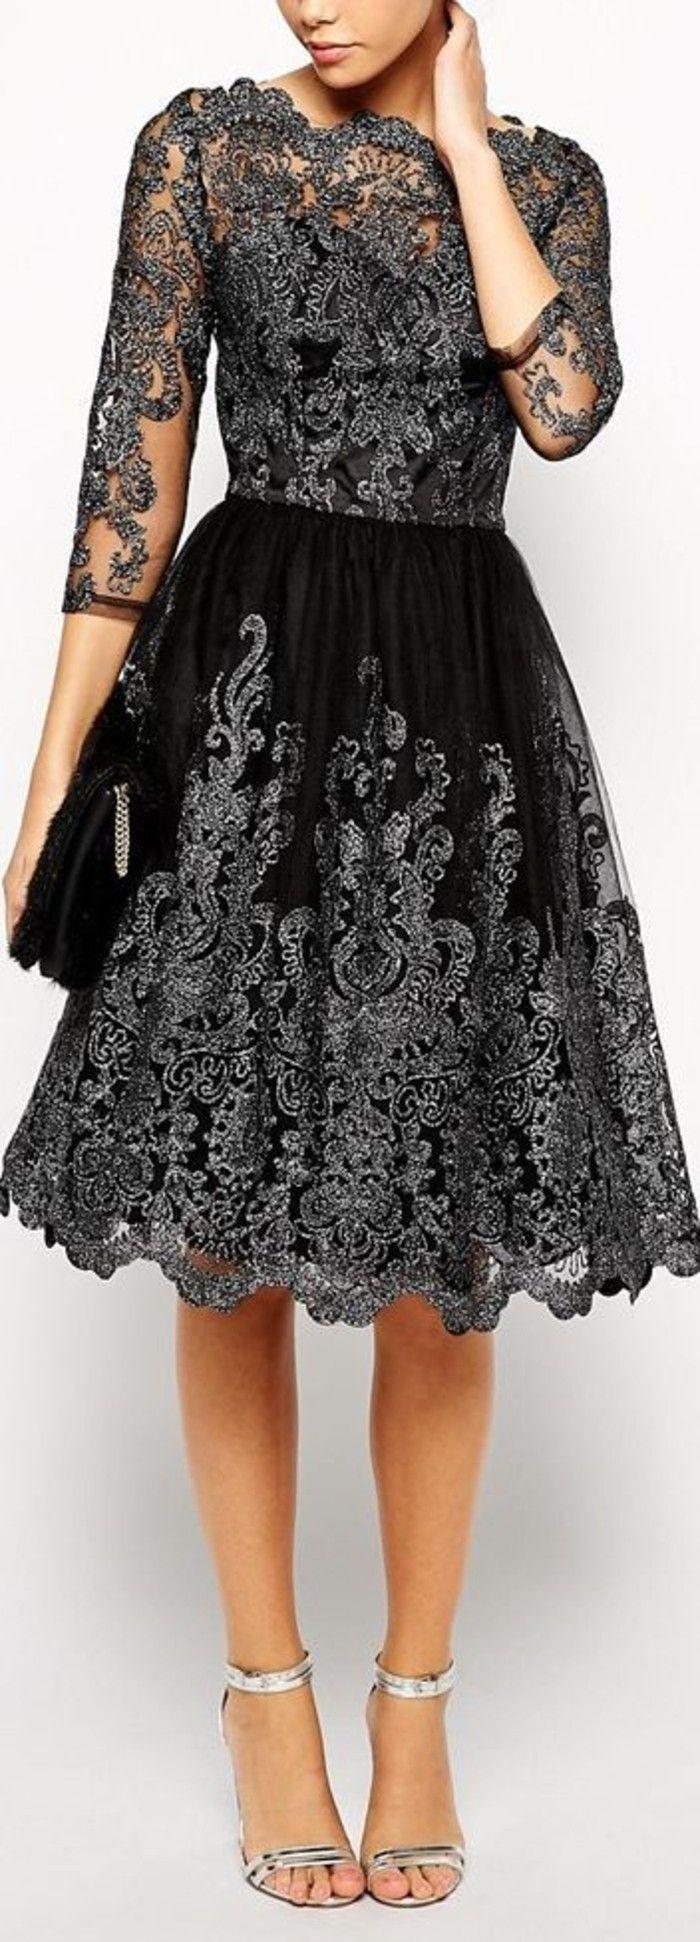 vestidos-de-fiesta-cortos-encaje-negro-bordado